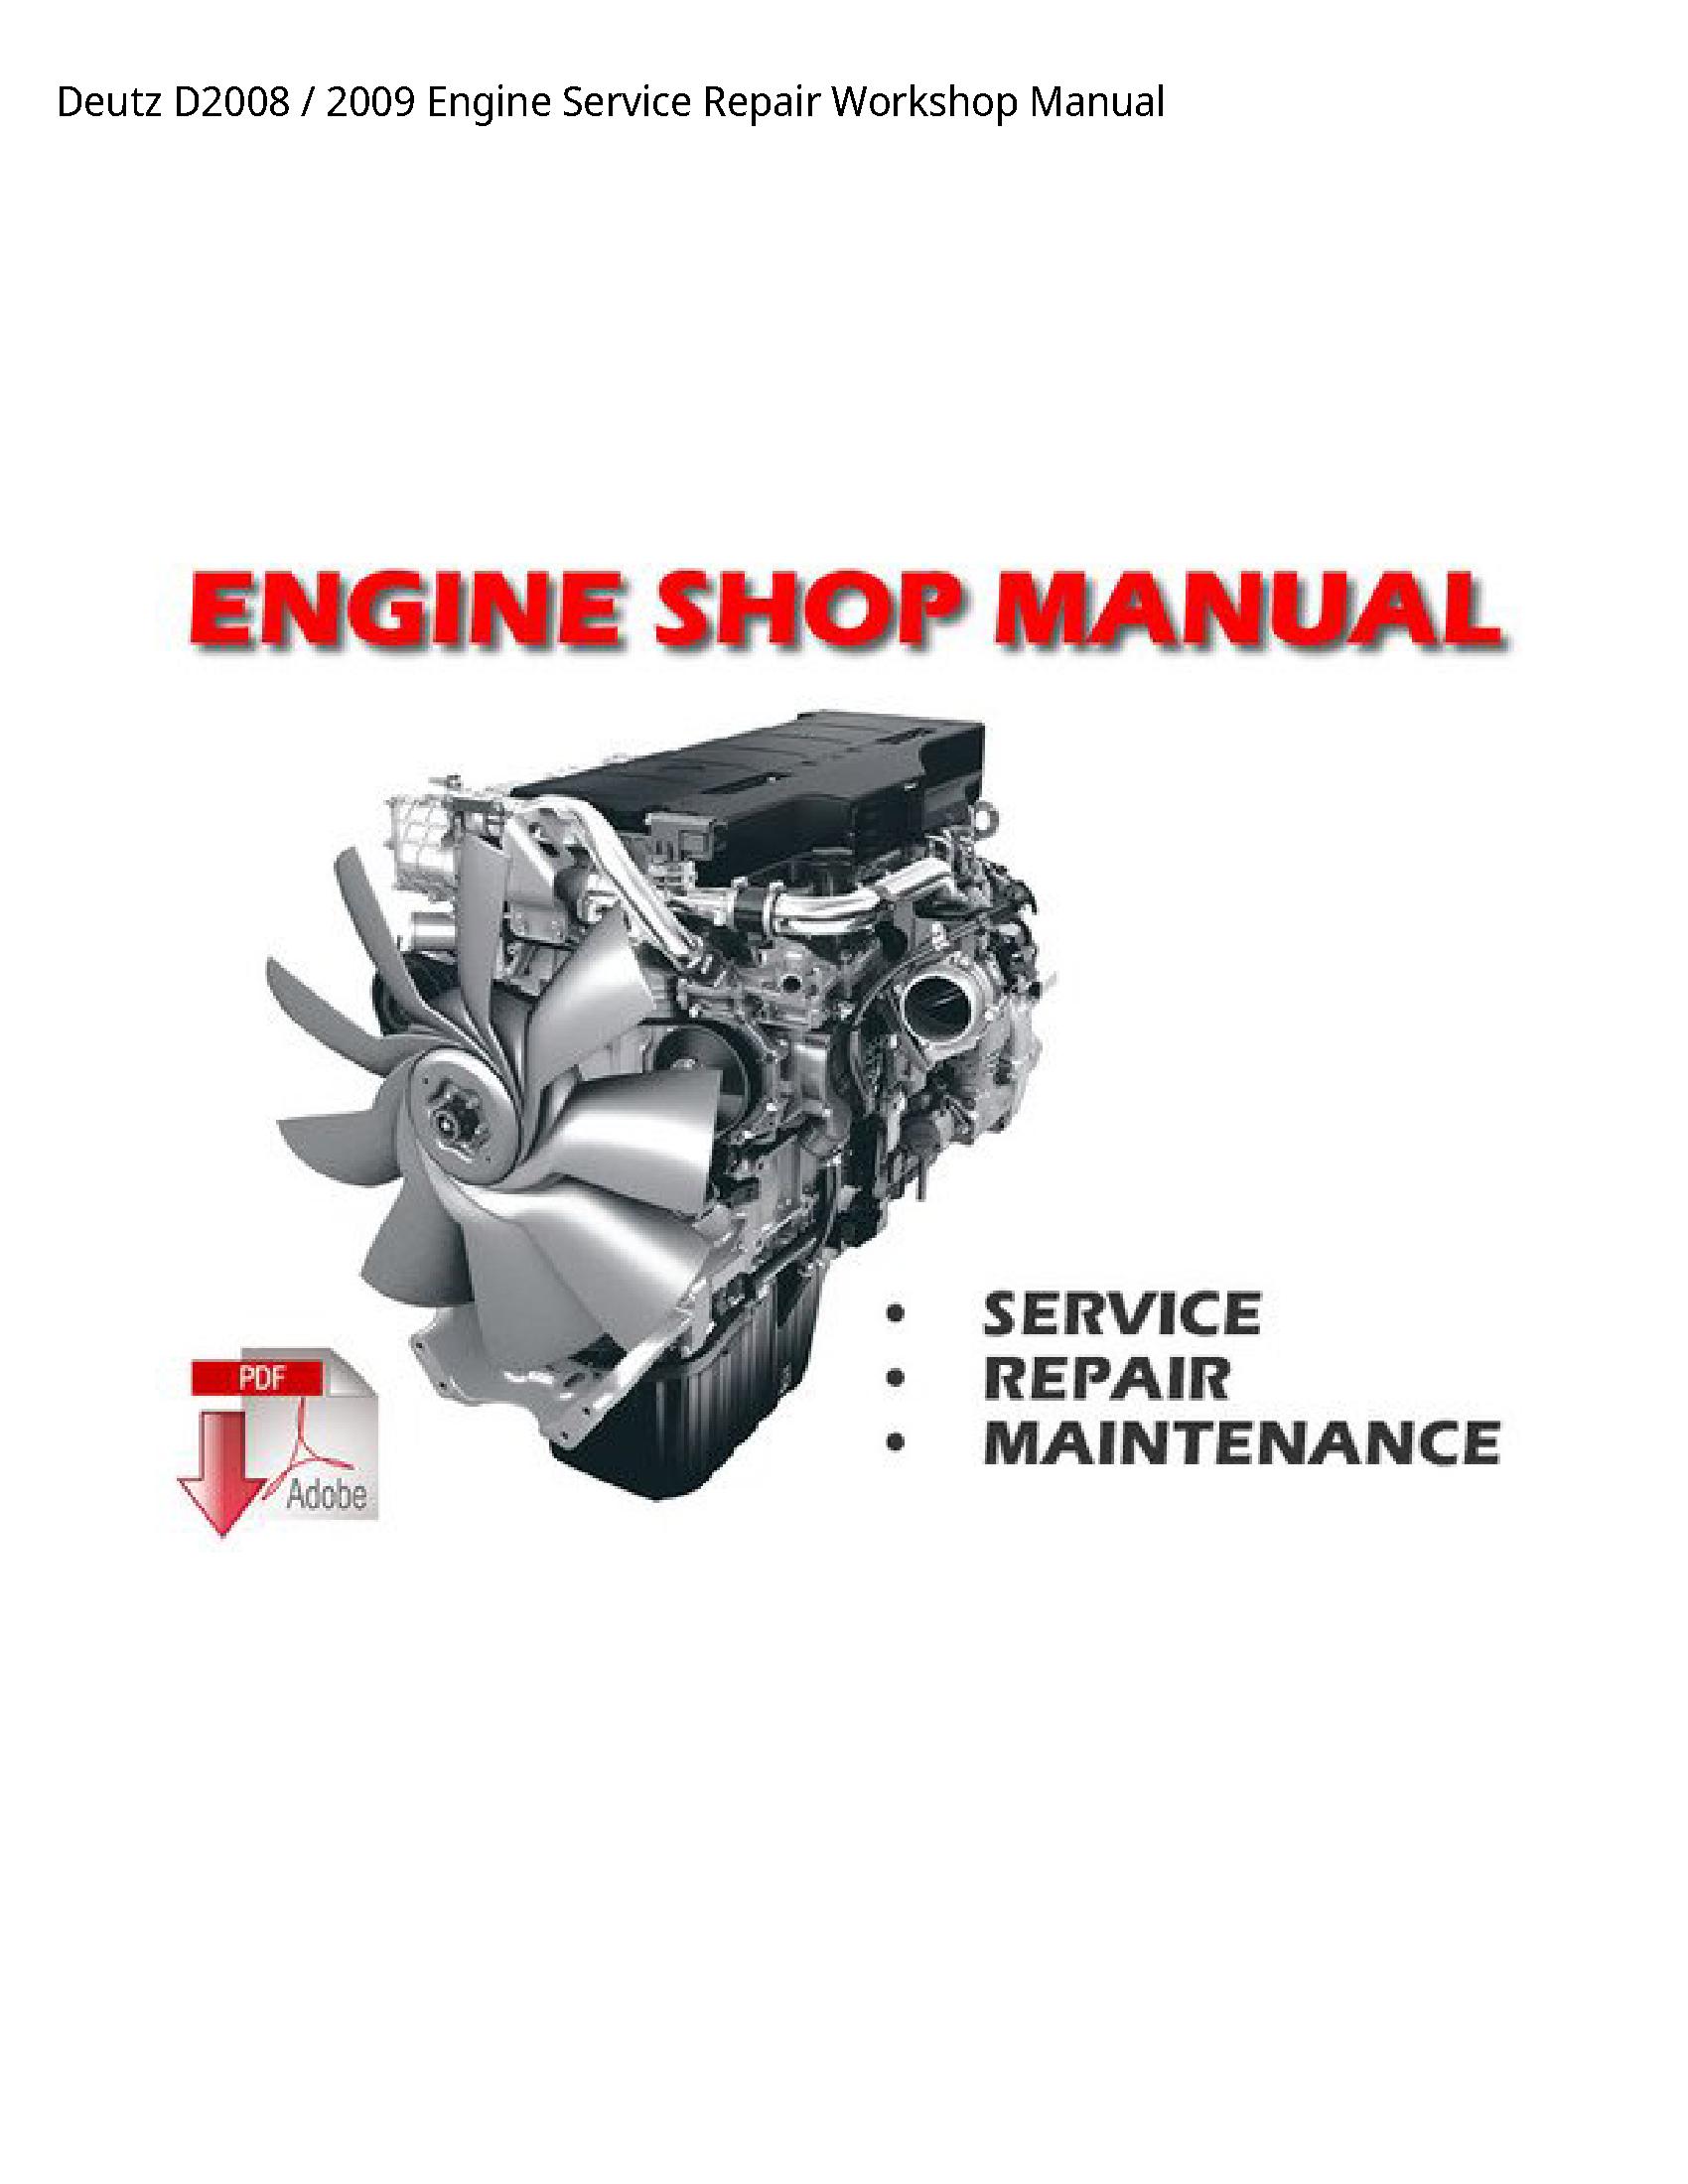 Deutz D2008 Engine manual